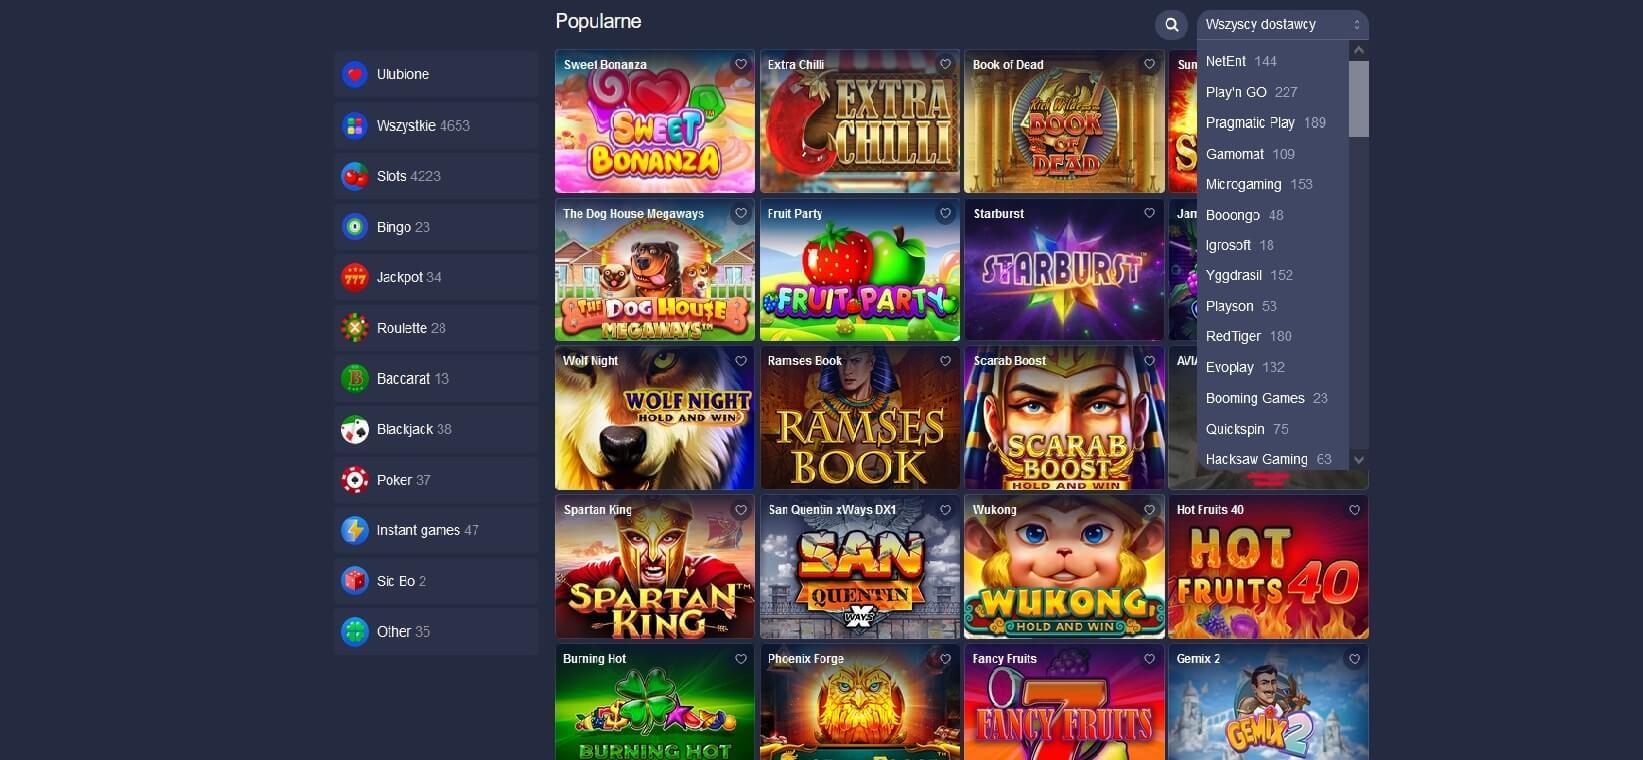 betmaster kasyno gry hazardowe screenshot